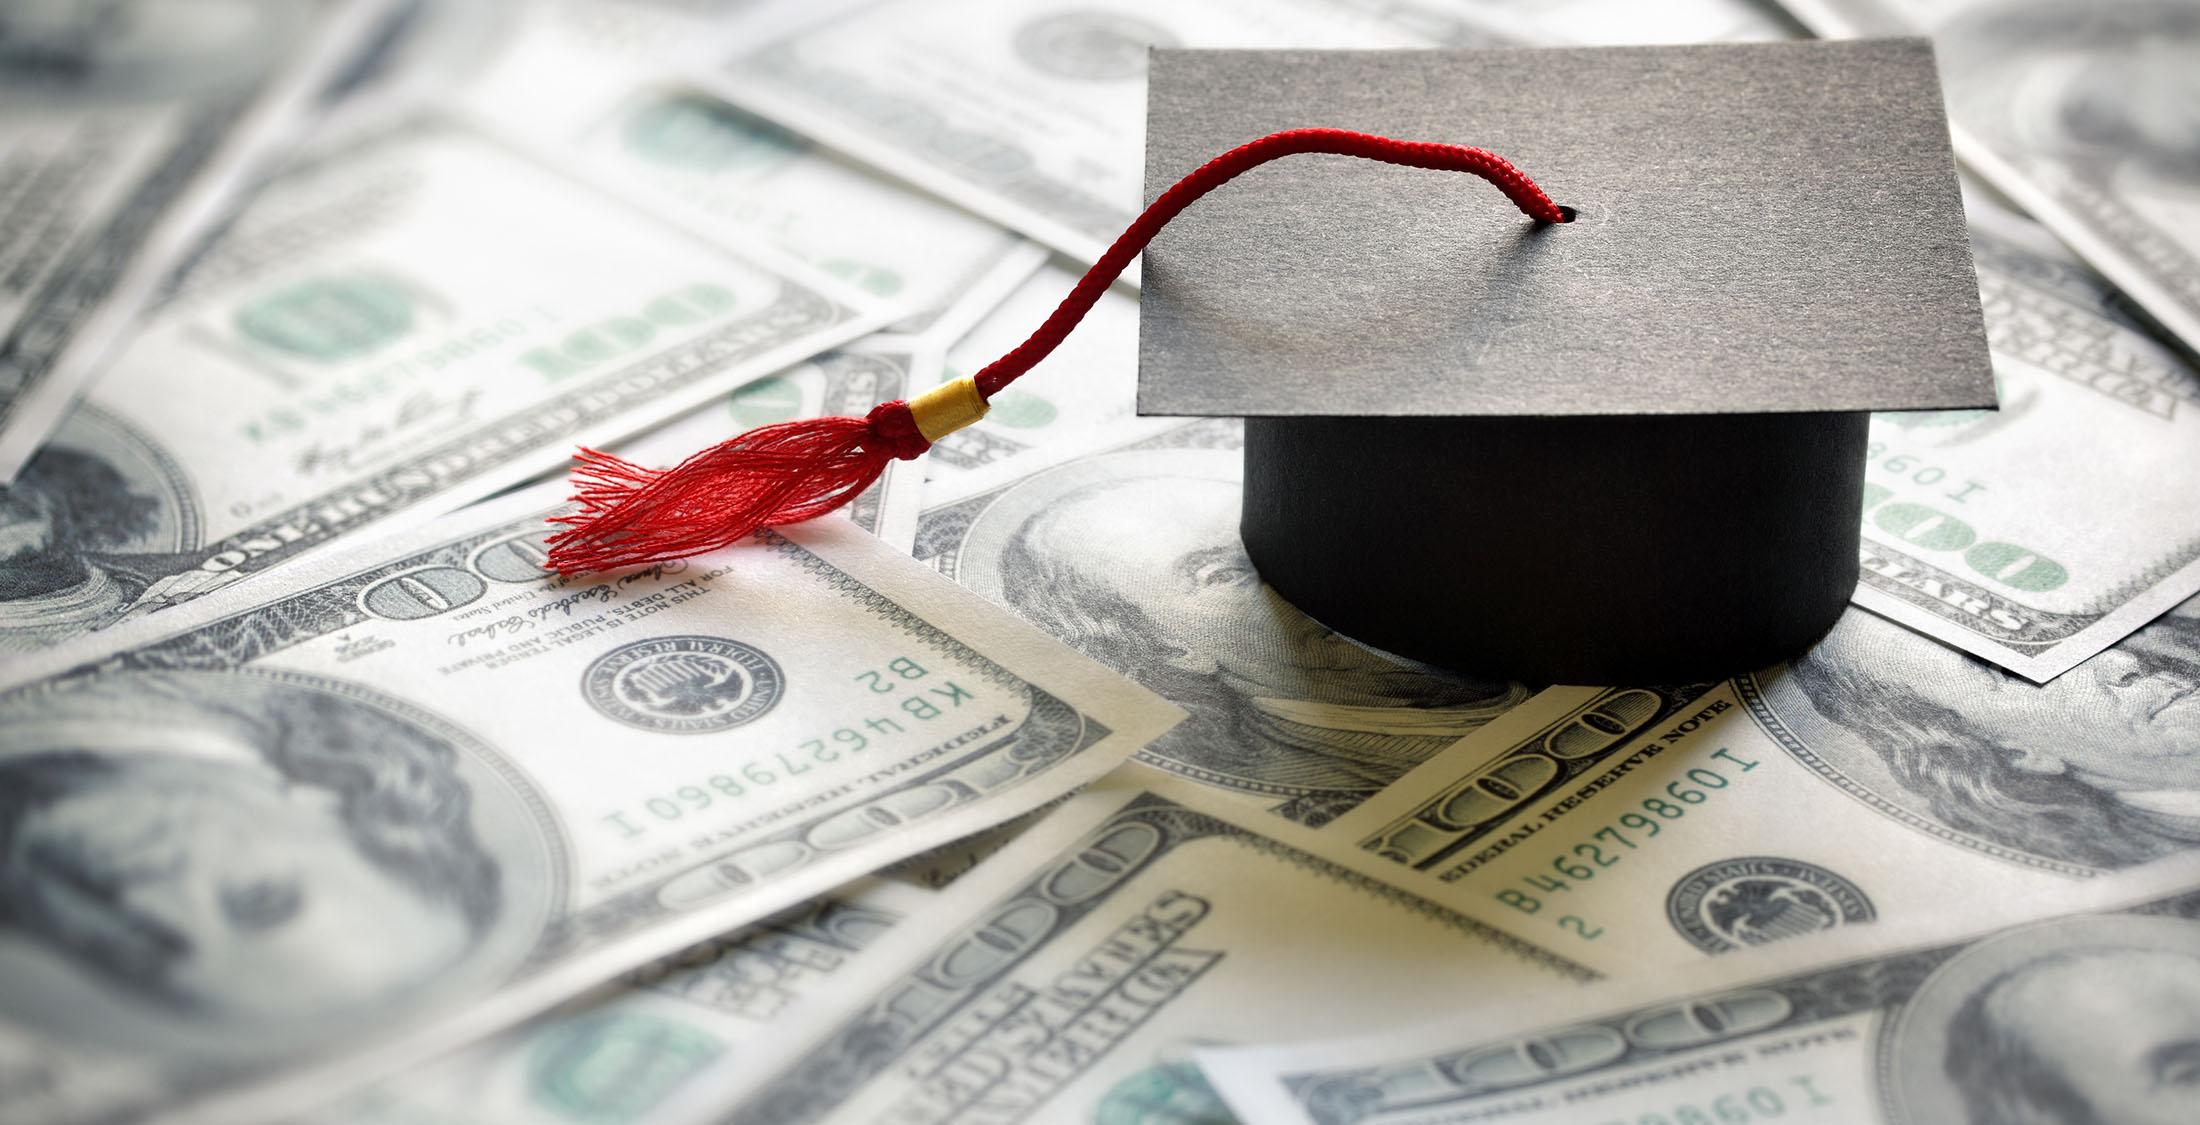 graduate cap on top of one hundred dollar bills